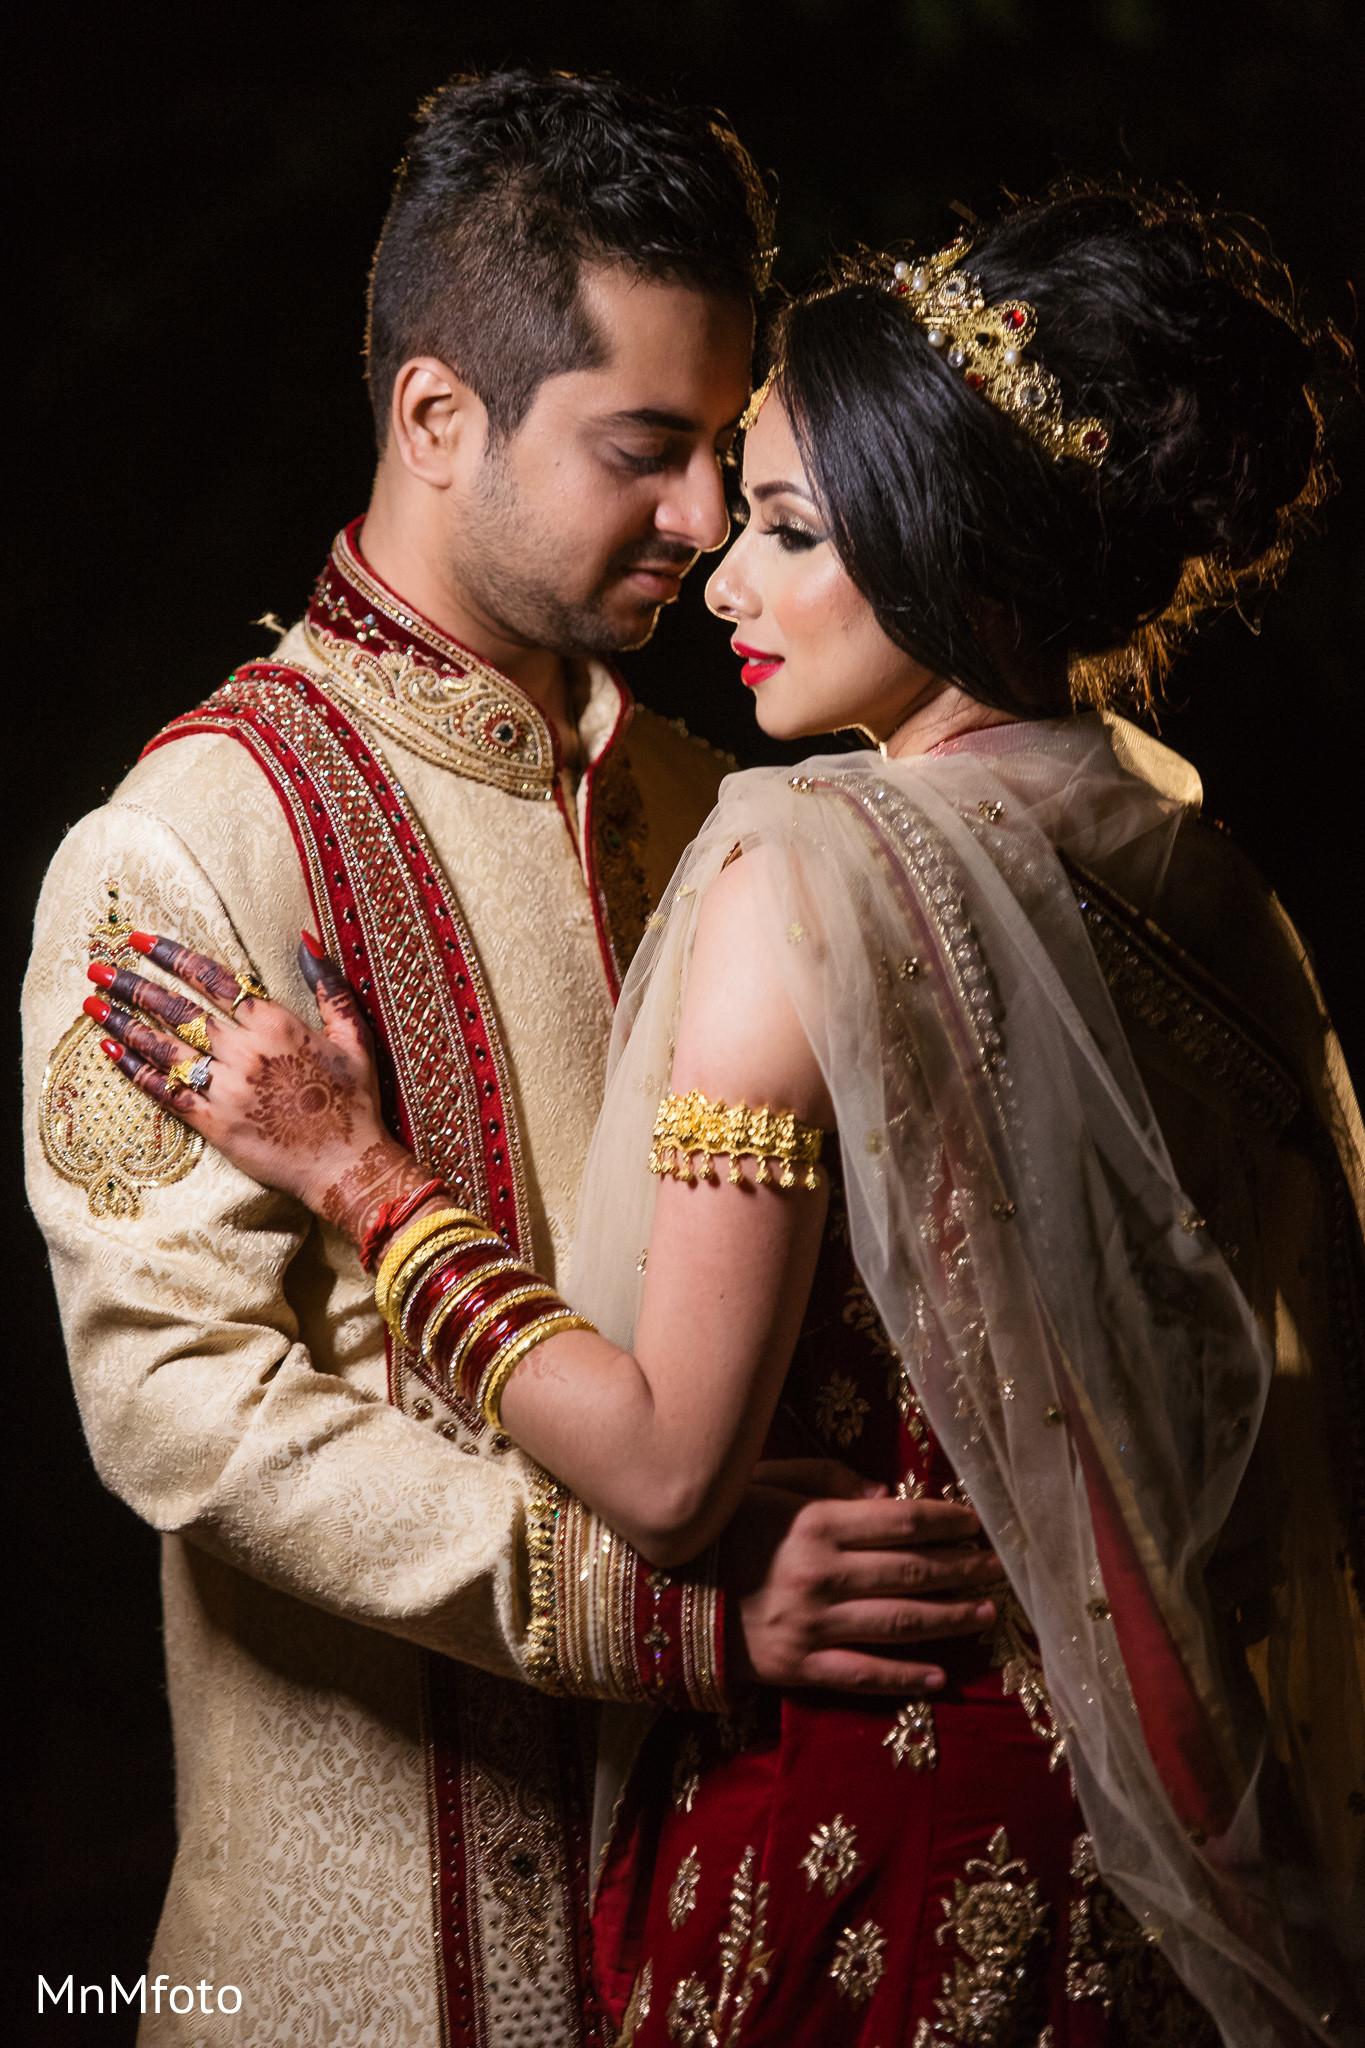 Portraits Photo 43315 Maharani Weddings